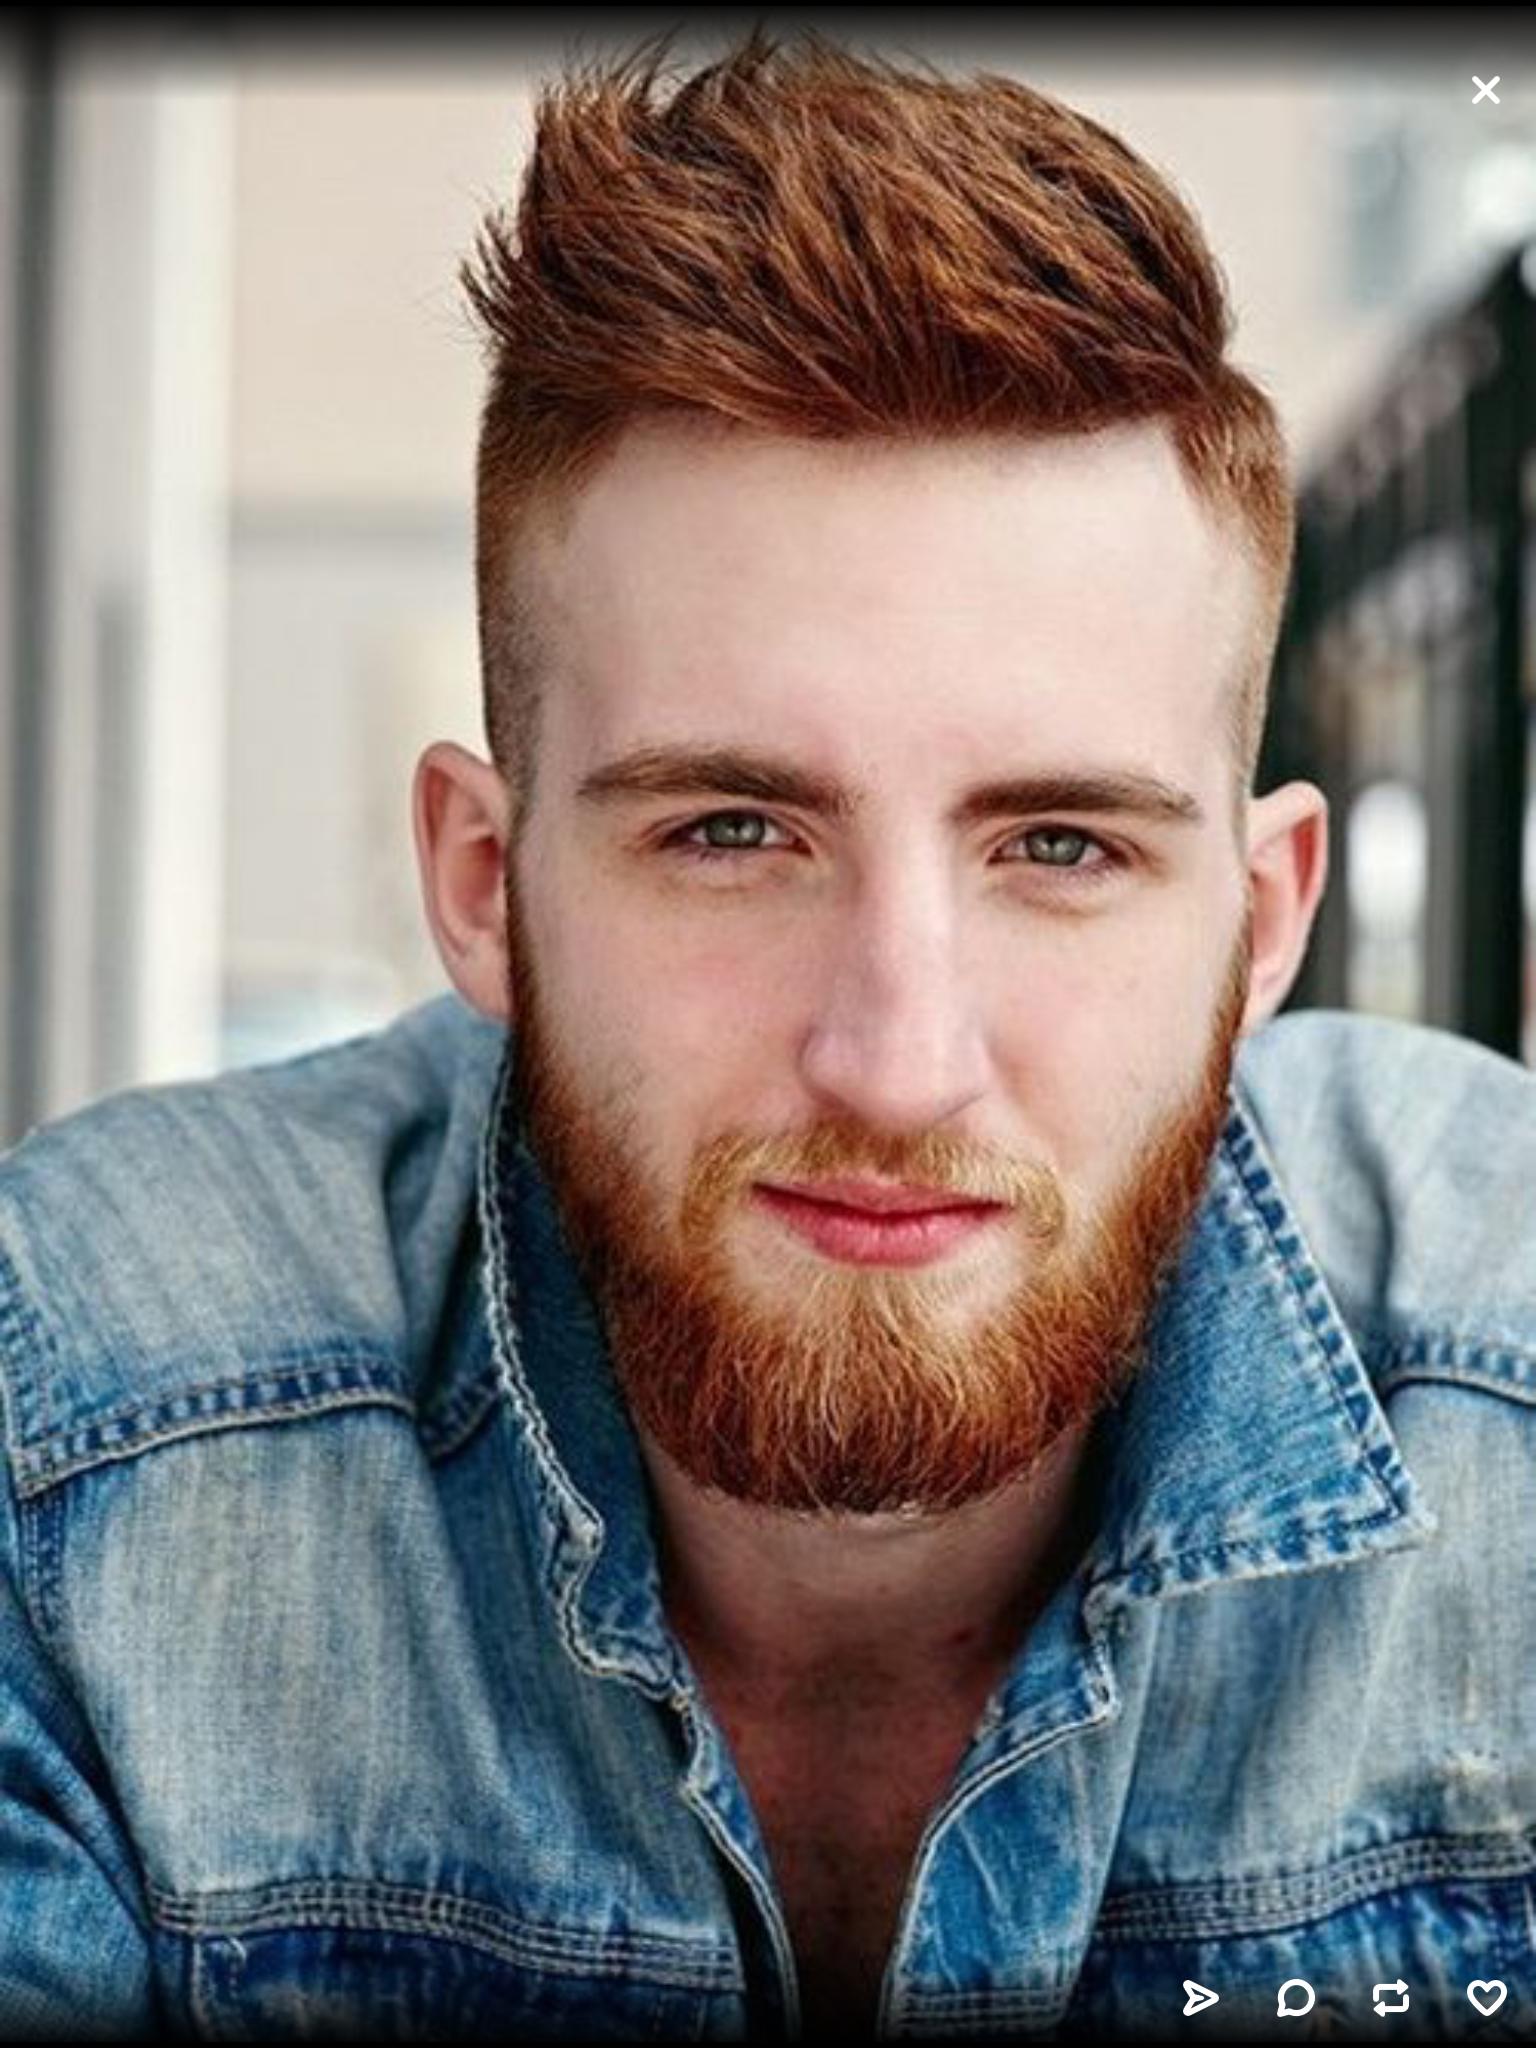 Haircuts men long ginger thriller  love a beard  pinterest  hair styles shaved